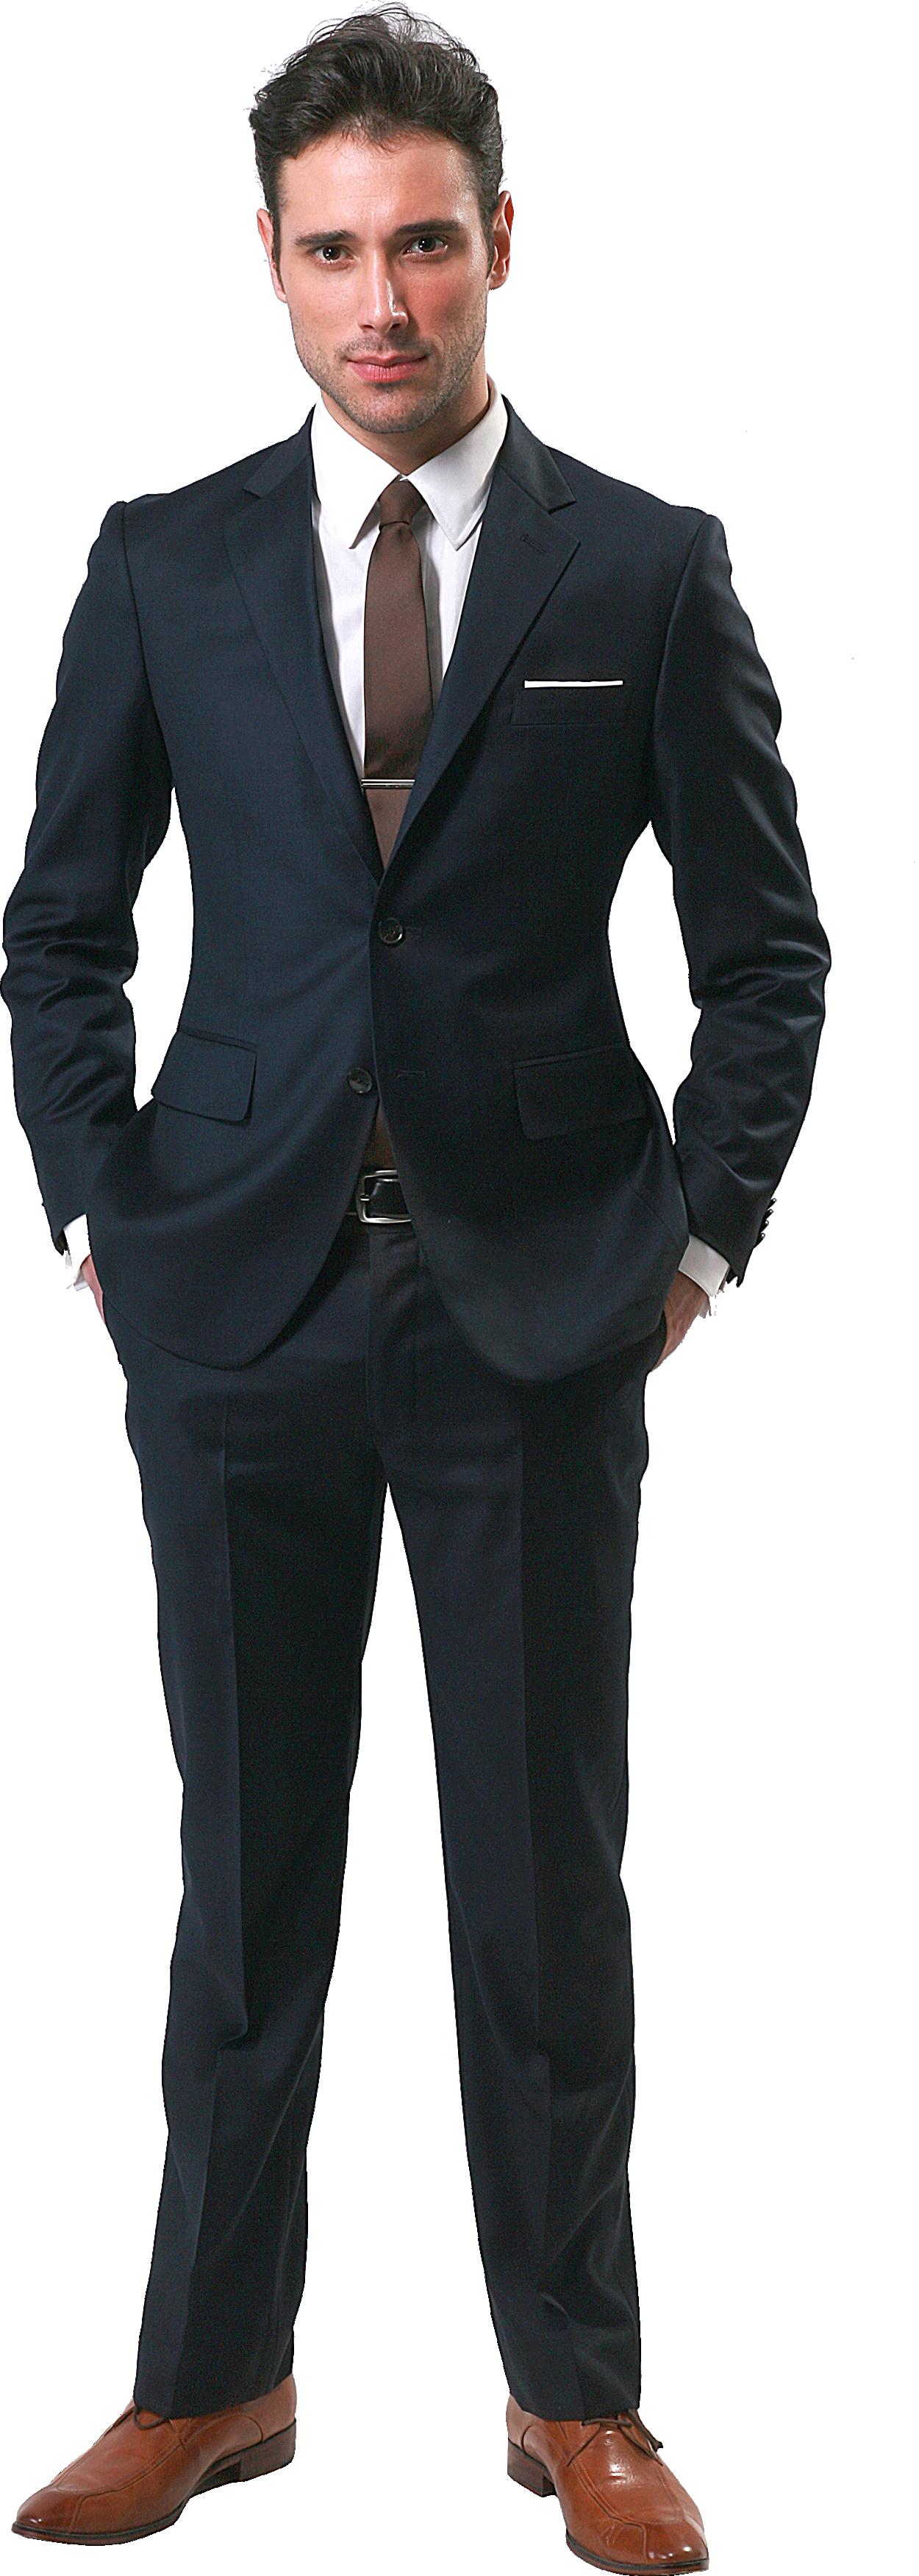 Businessman PNG - 24725